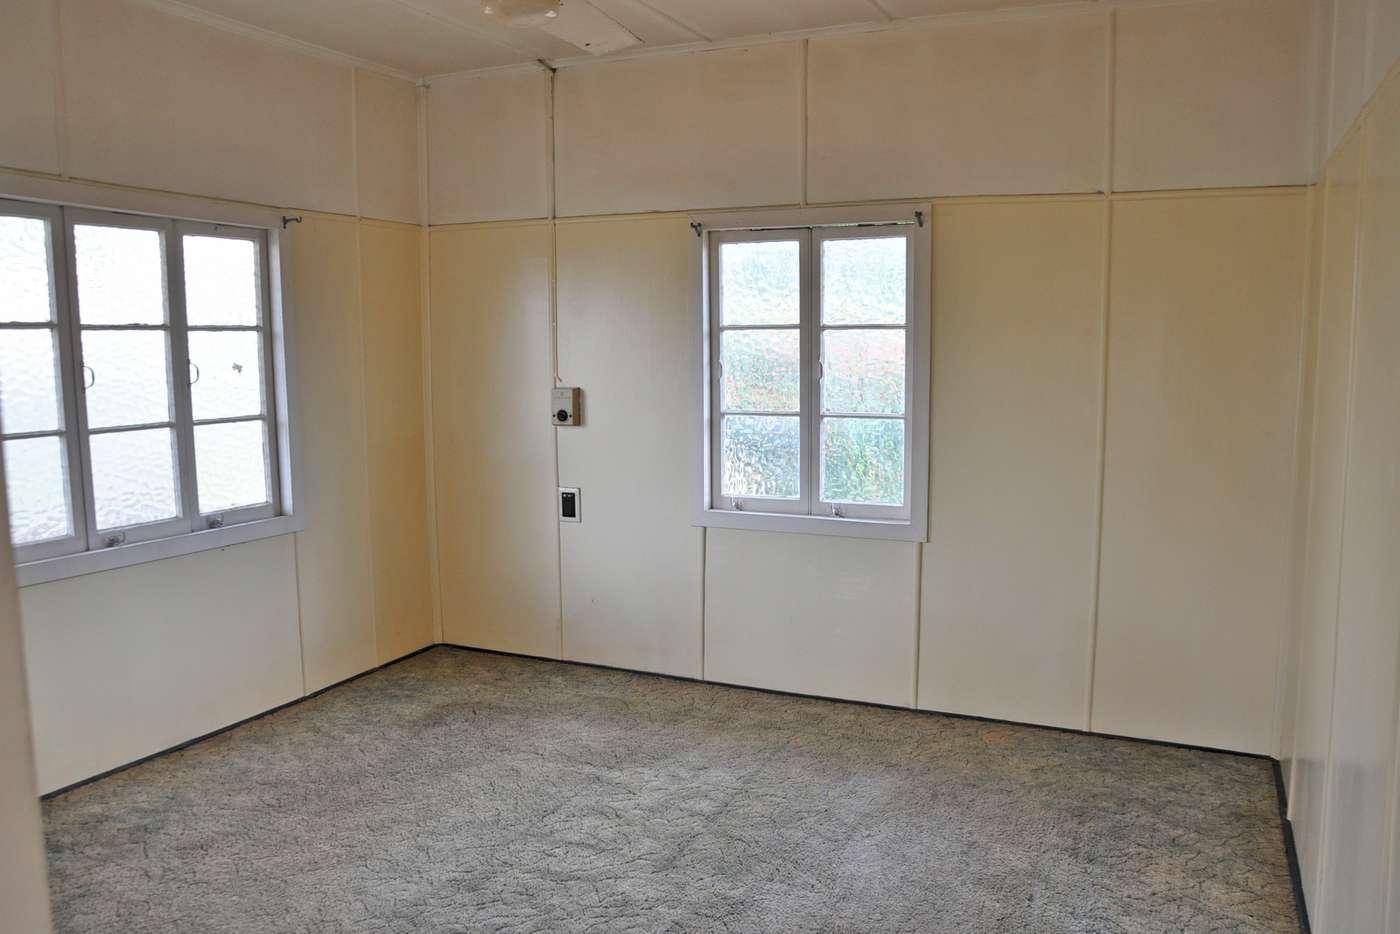 Sixth view of Homely house listing, 58 Mason Street, Mareeba QLD 4880